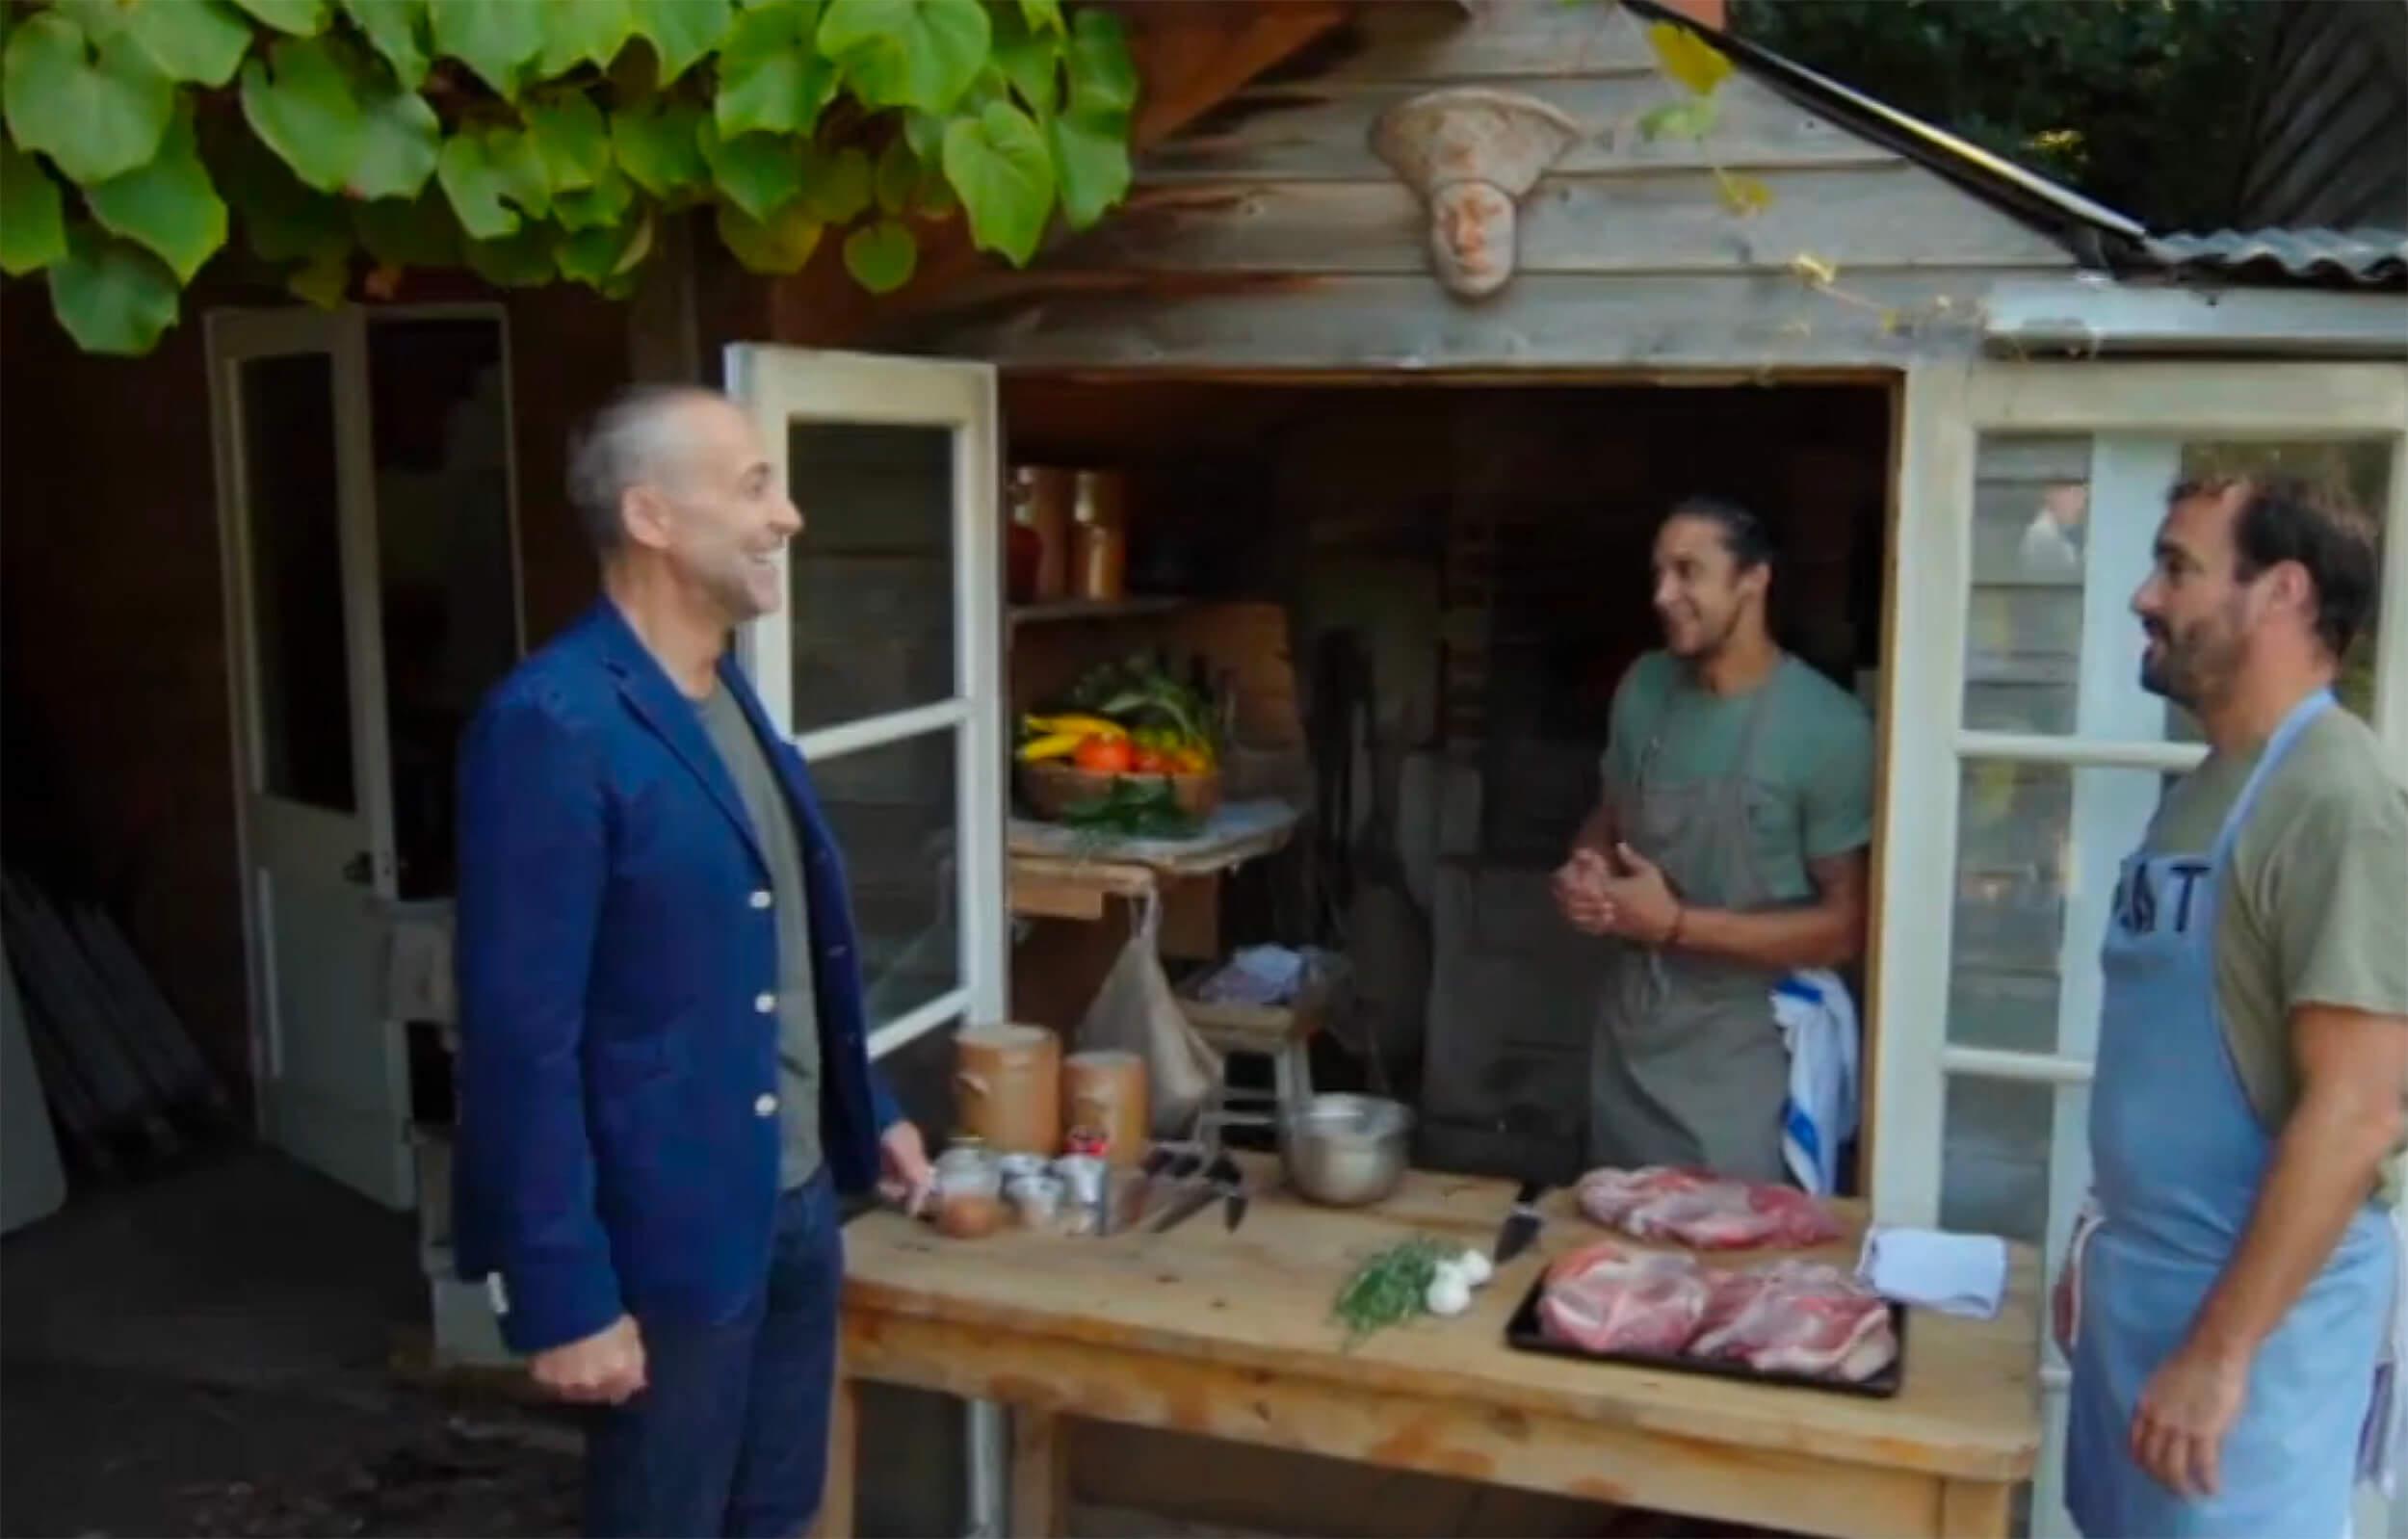 Bakery scene from Hidden Restaurants TV Show